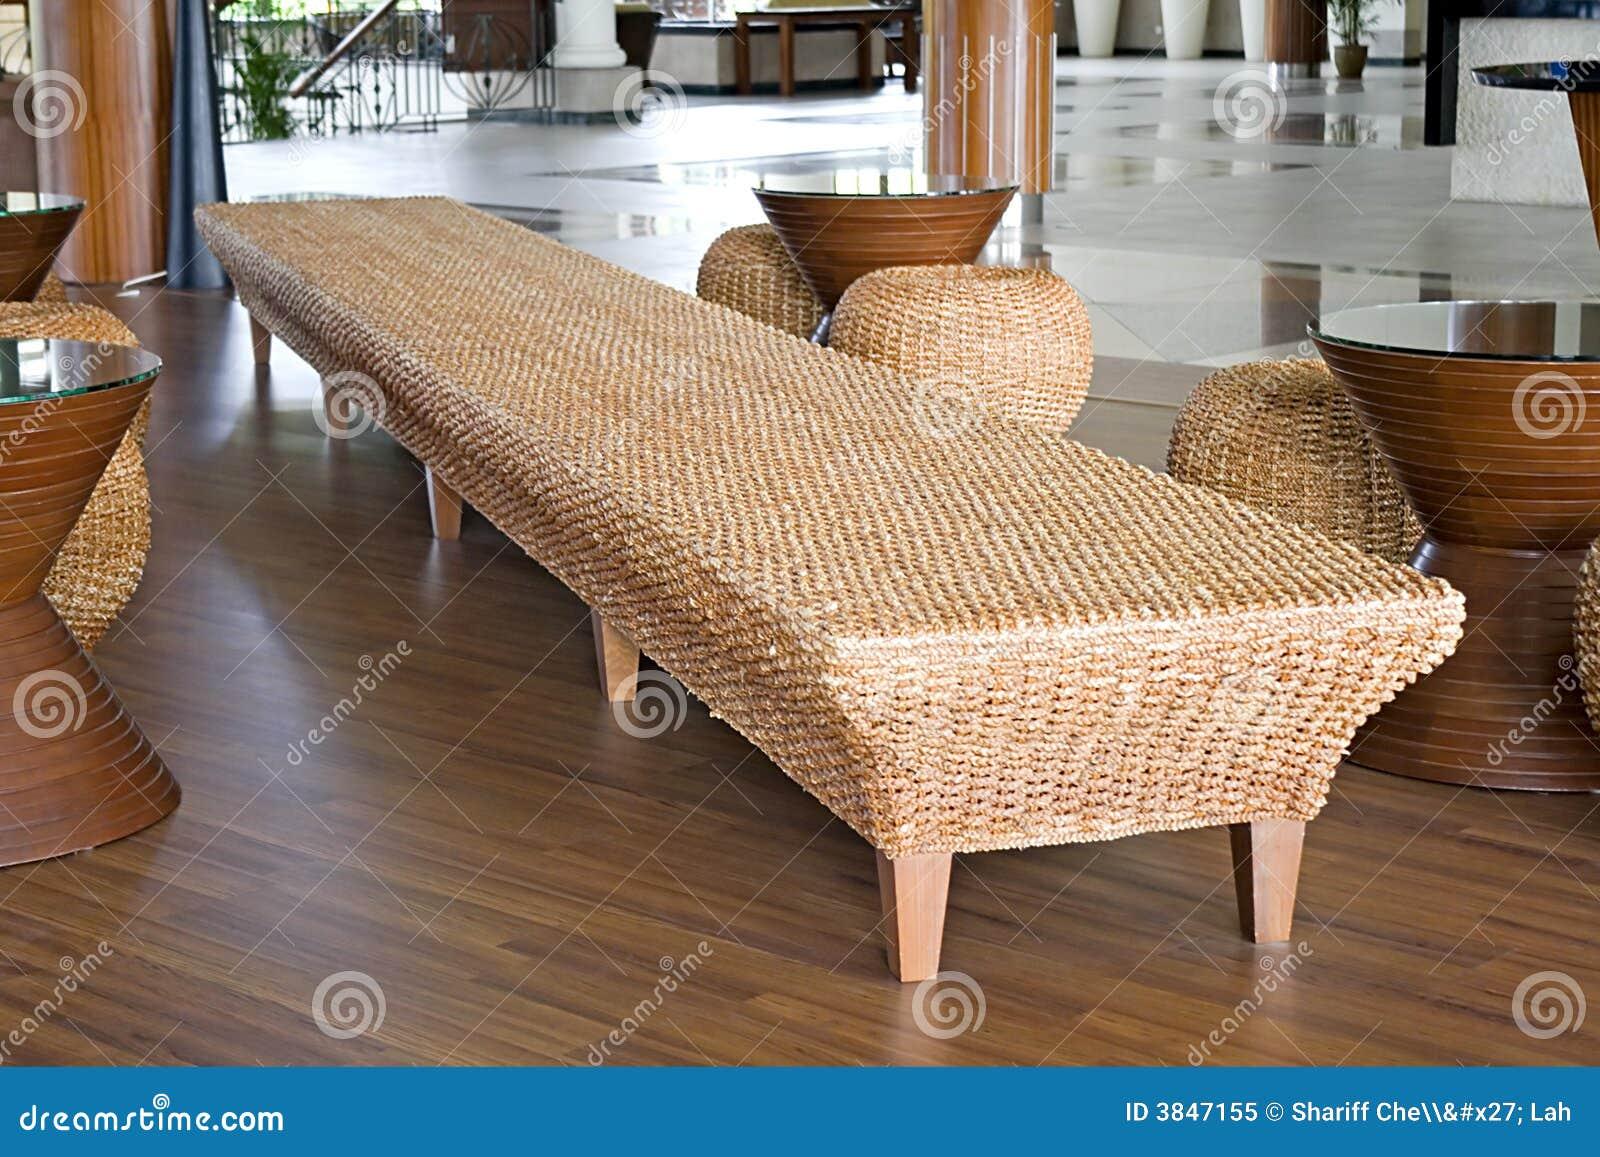 Rattan and jute furniture stock image image of furniture - Muebles de rattan ...